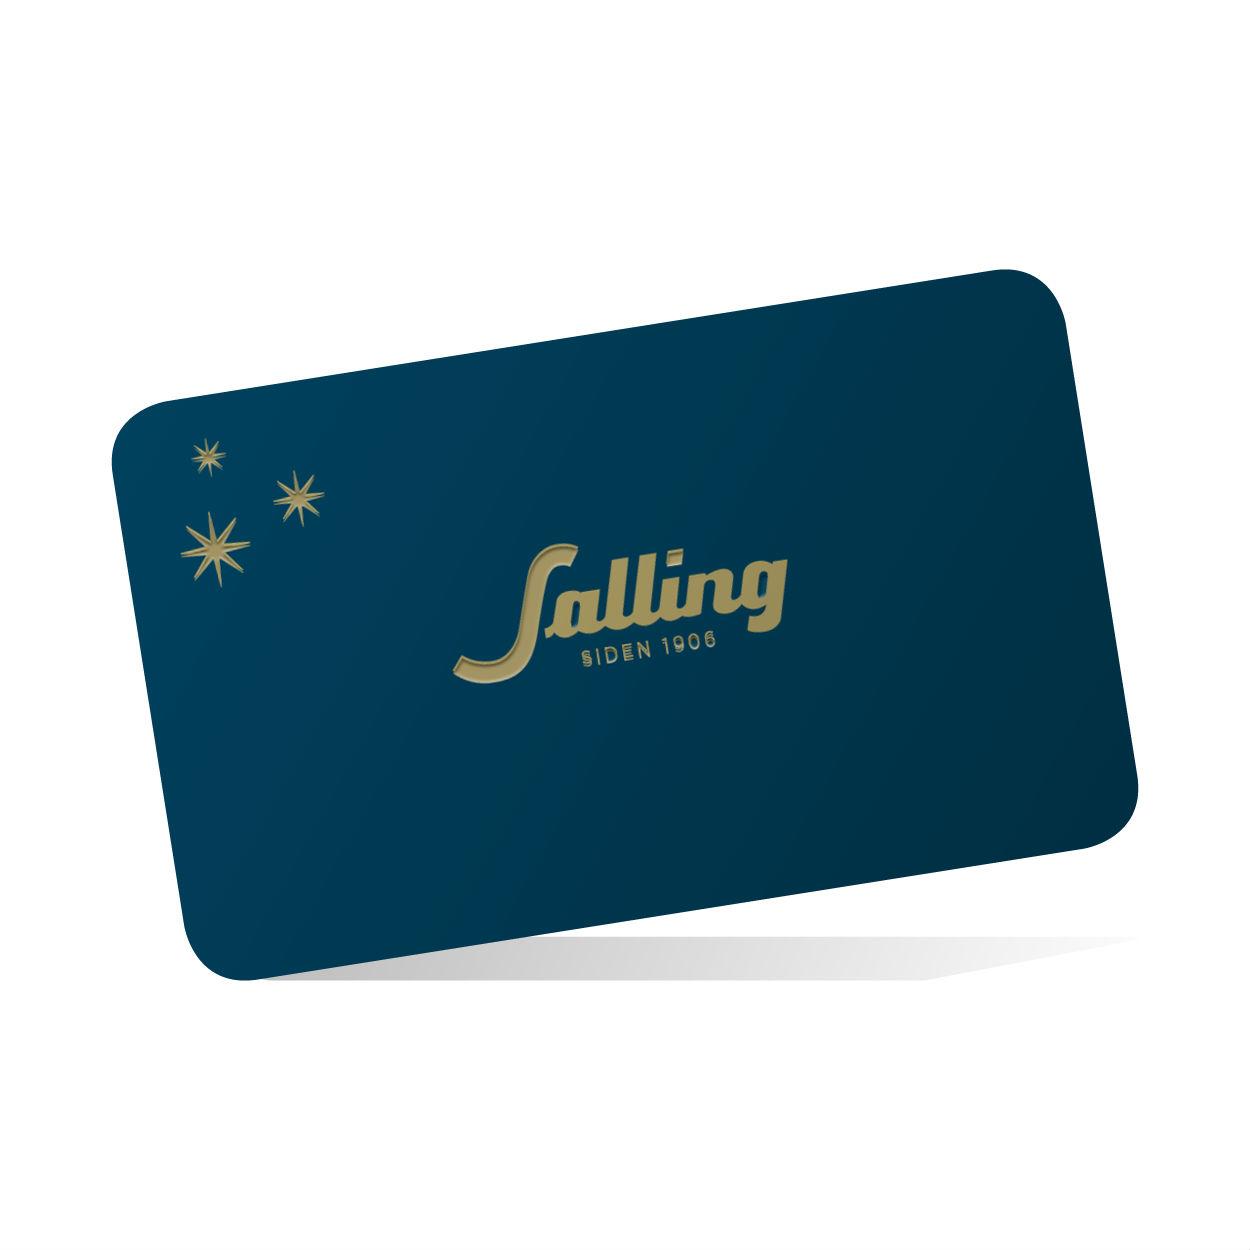 Salling gavekort - 1300 kr